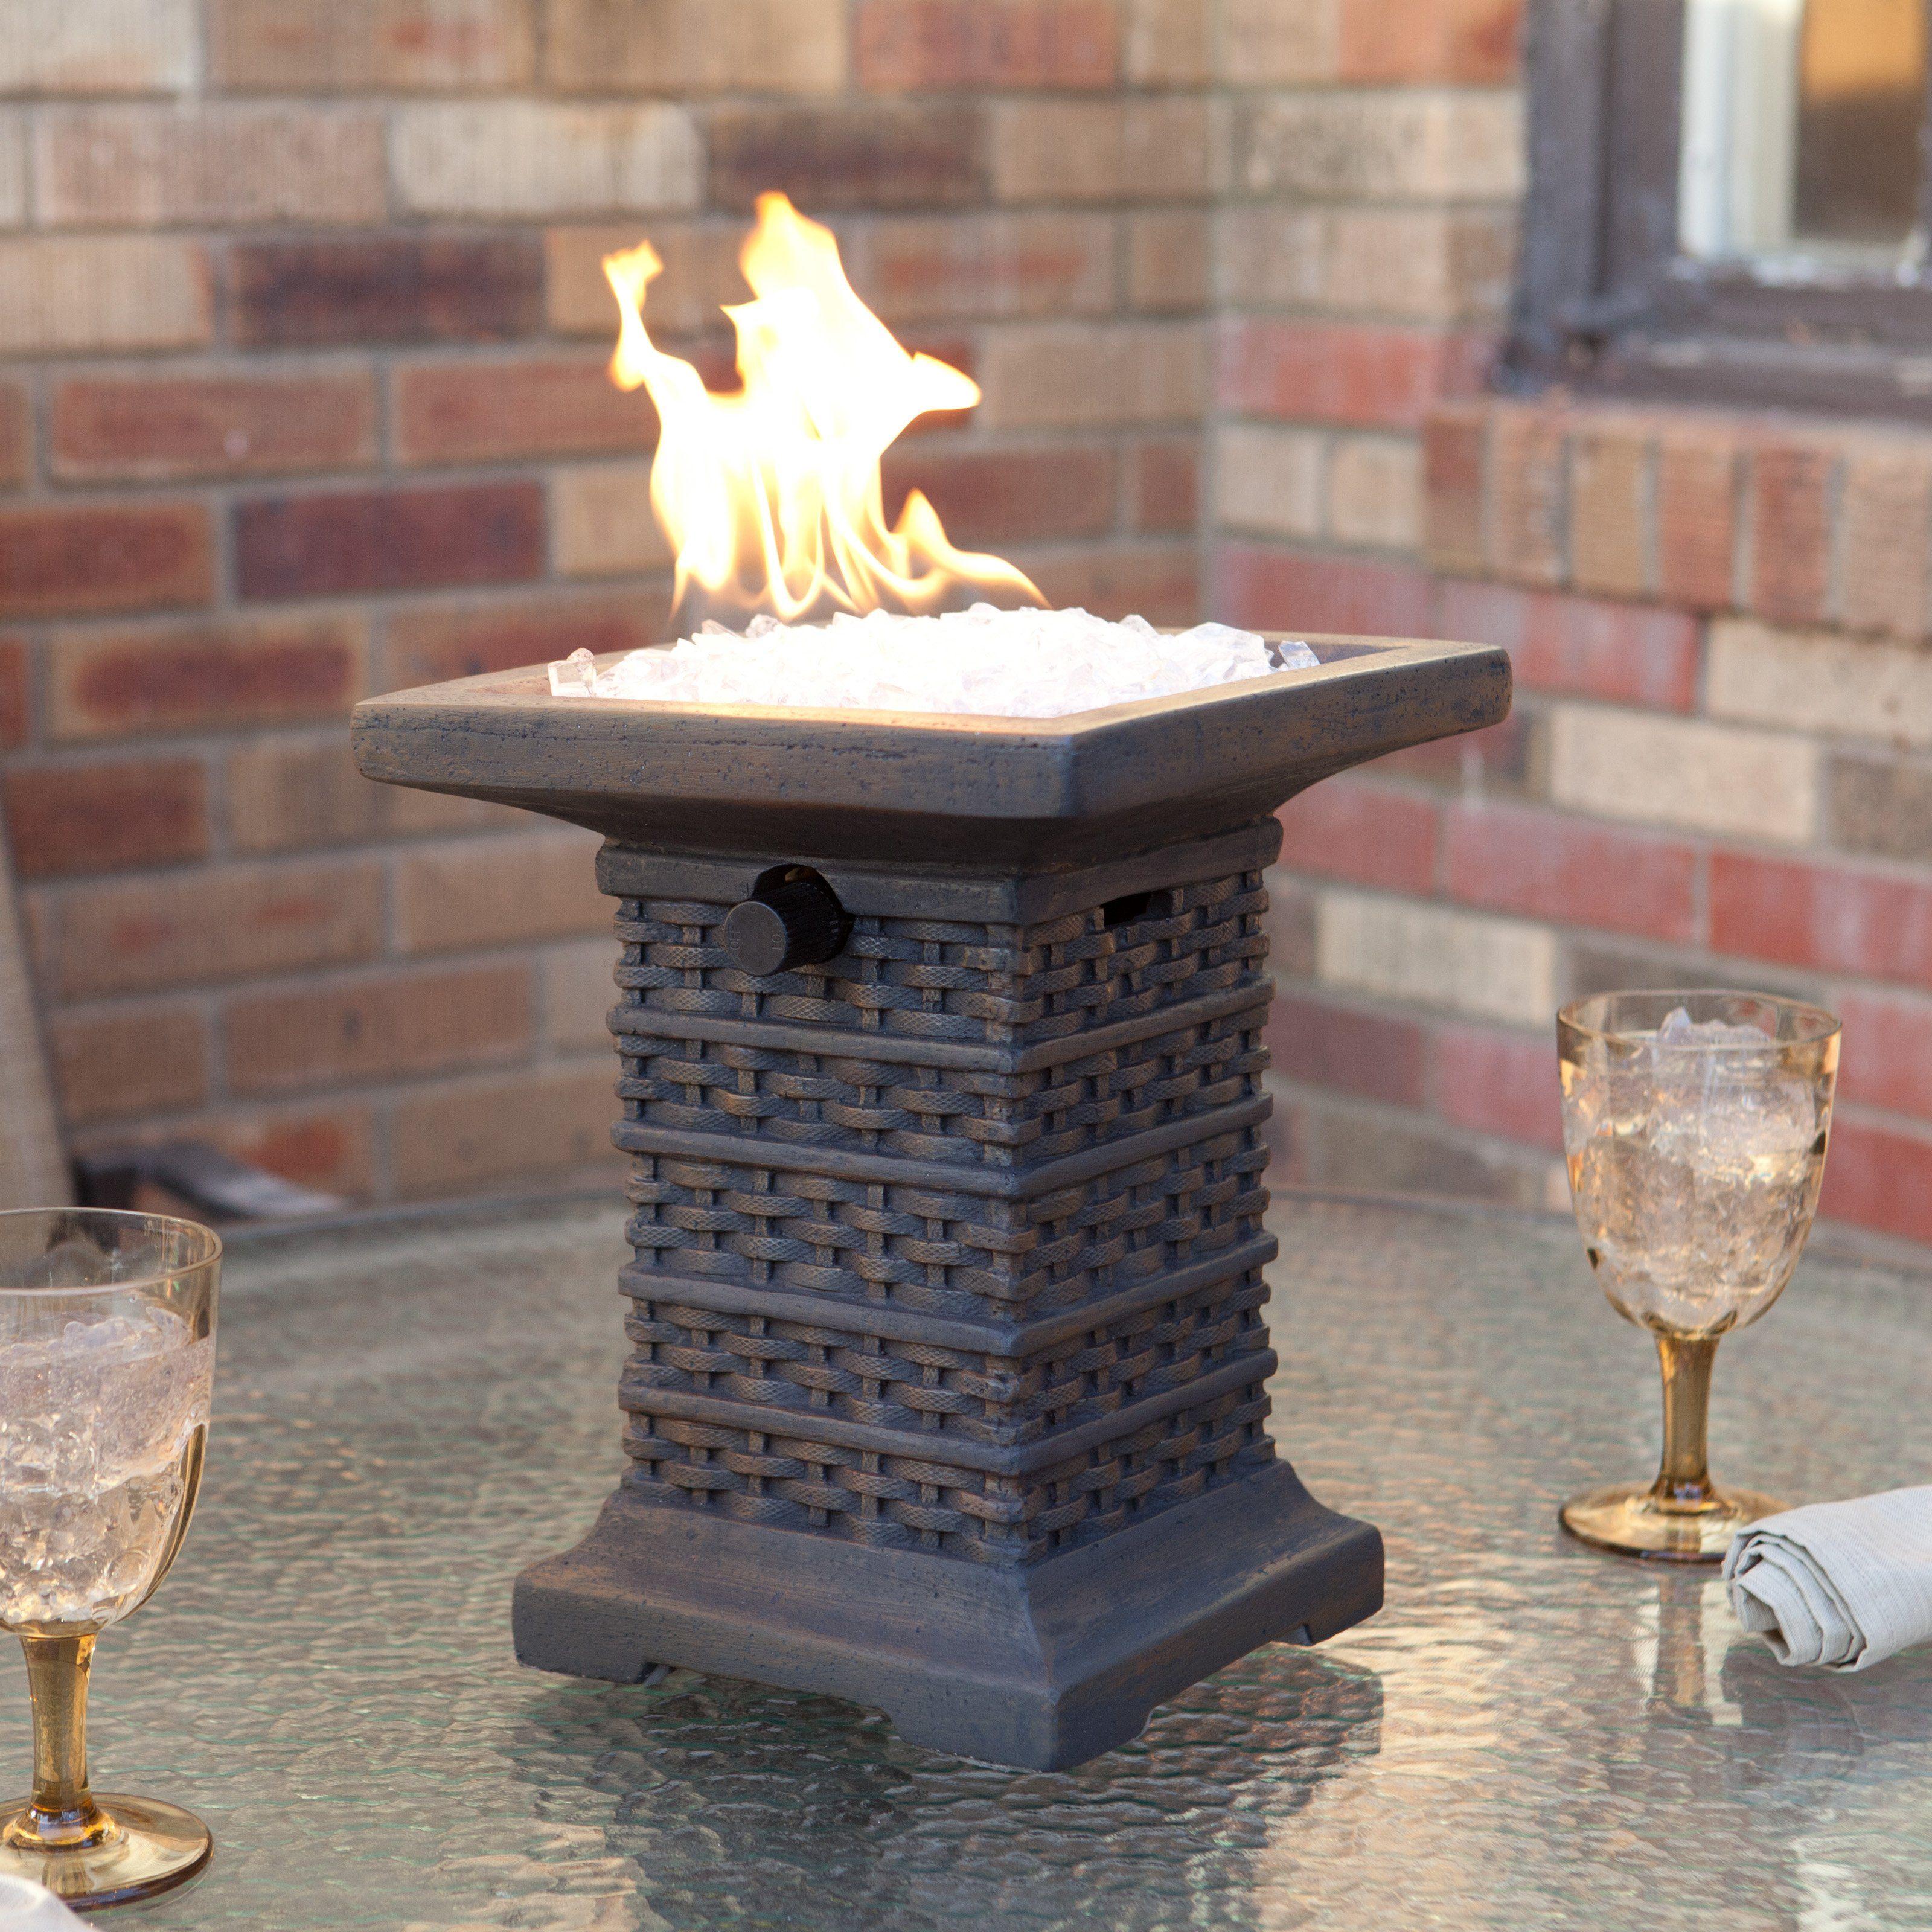 Tahiti wicker pattern table top propane fire bowl 86 99